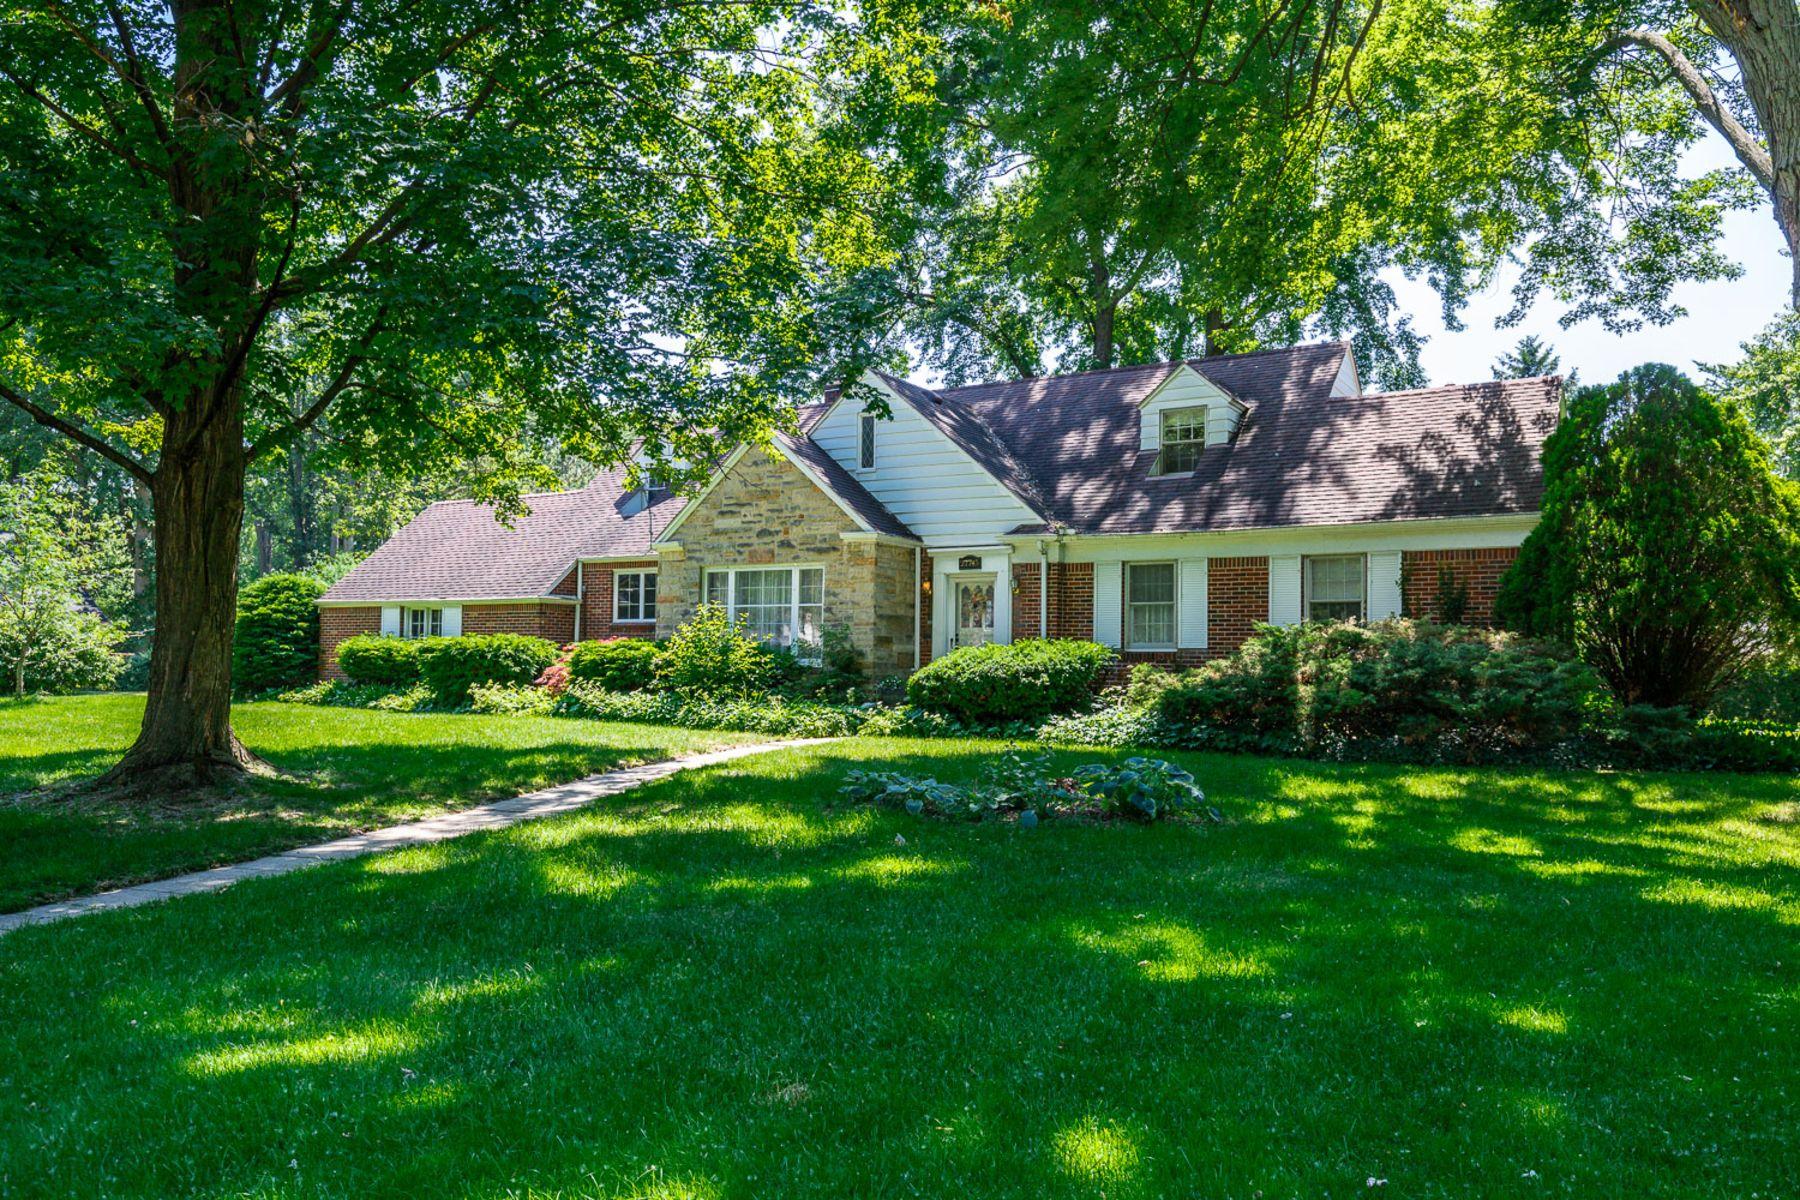 Single Family Homes for Active at Lathrup Village 27745 Rackham Dr Lathrup Village, Michigan 48076 United States